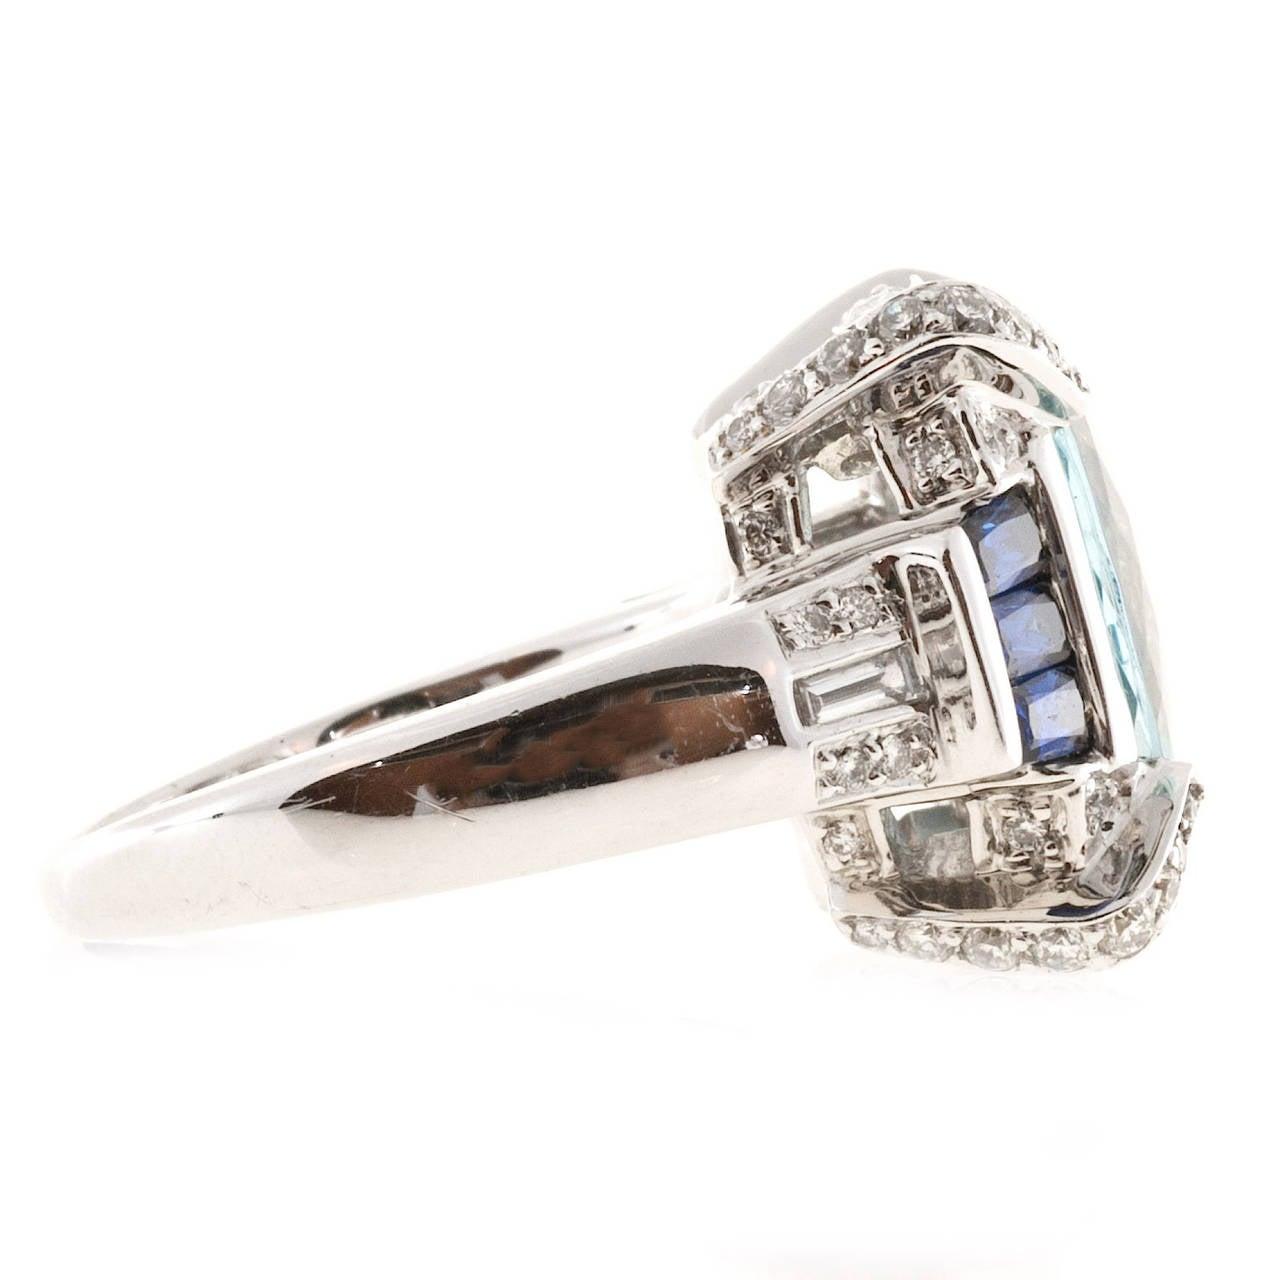 Charles Krypell Aquamarine Sapphire Diamond Gold Cocktail Ring 4